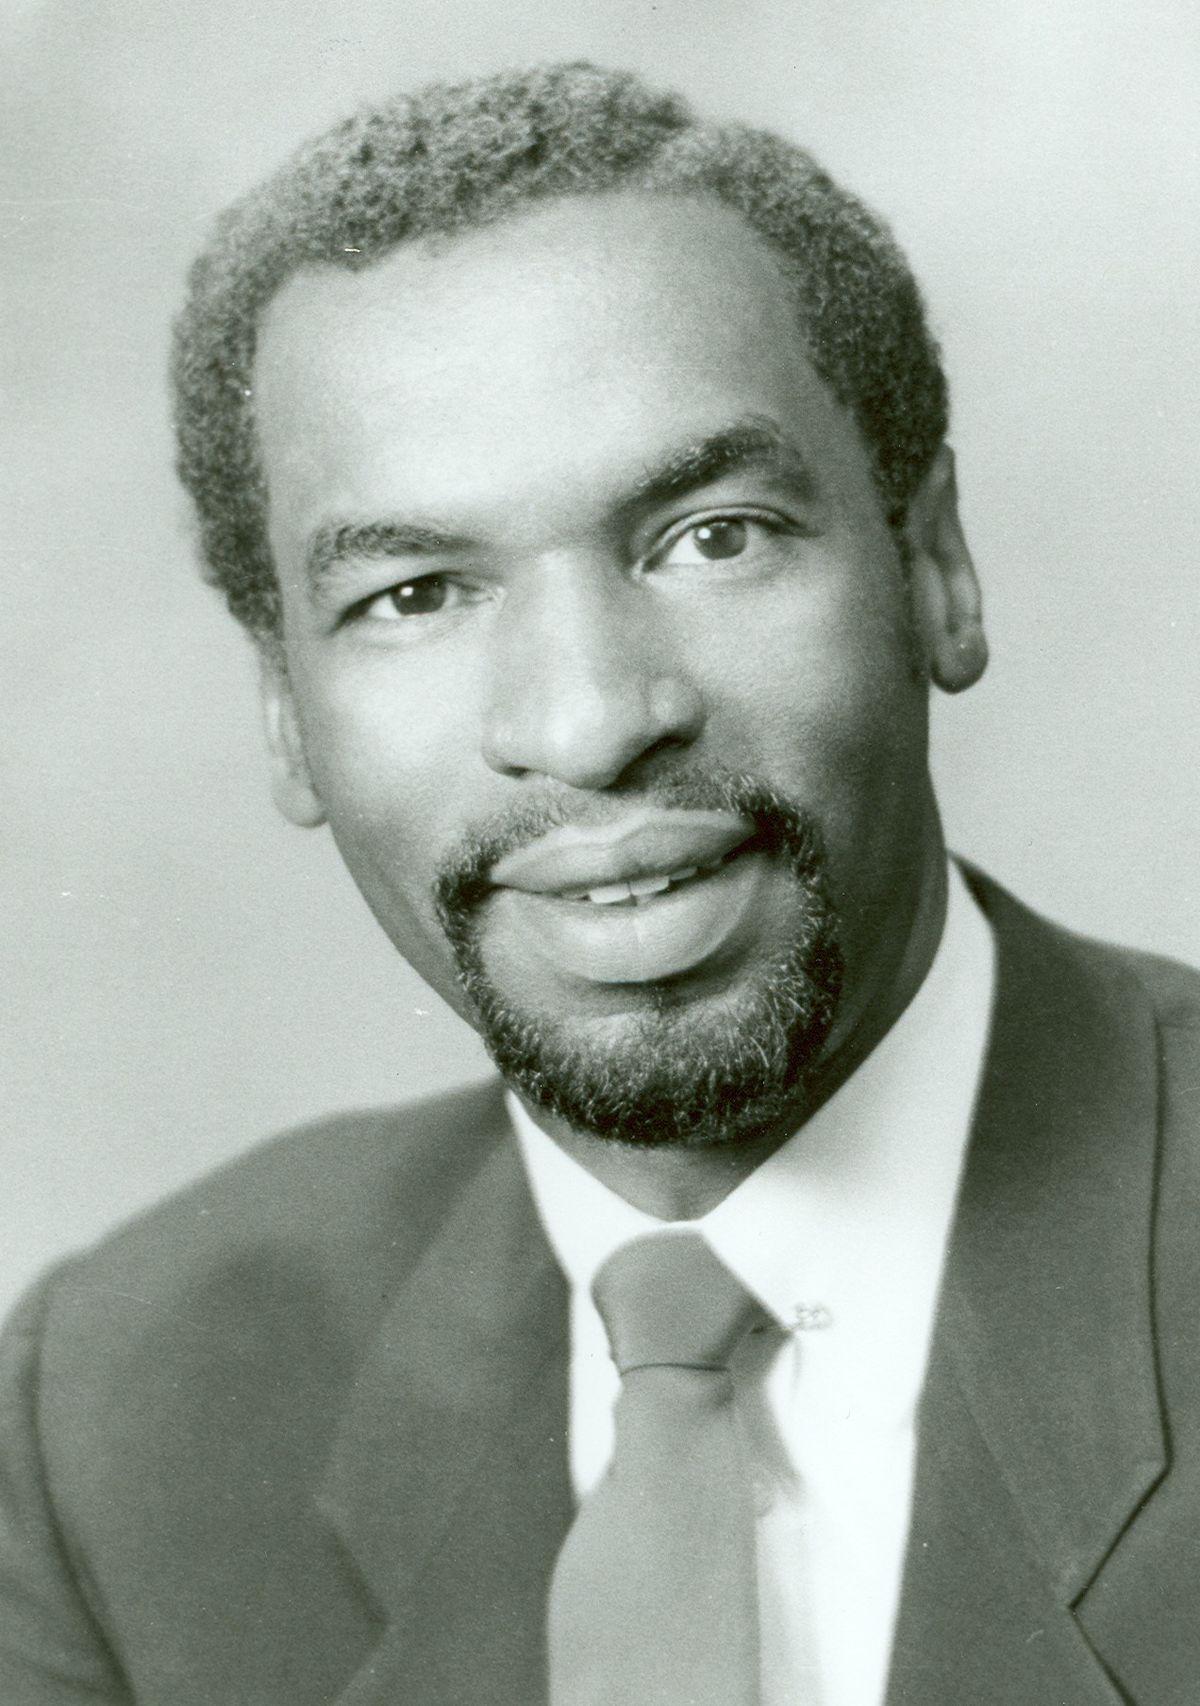 Rev. Floyd Flake